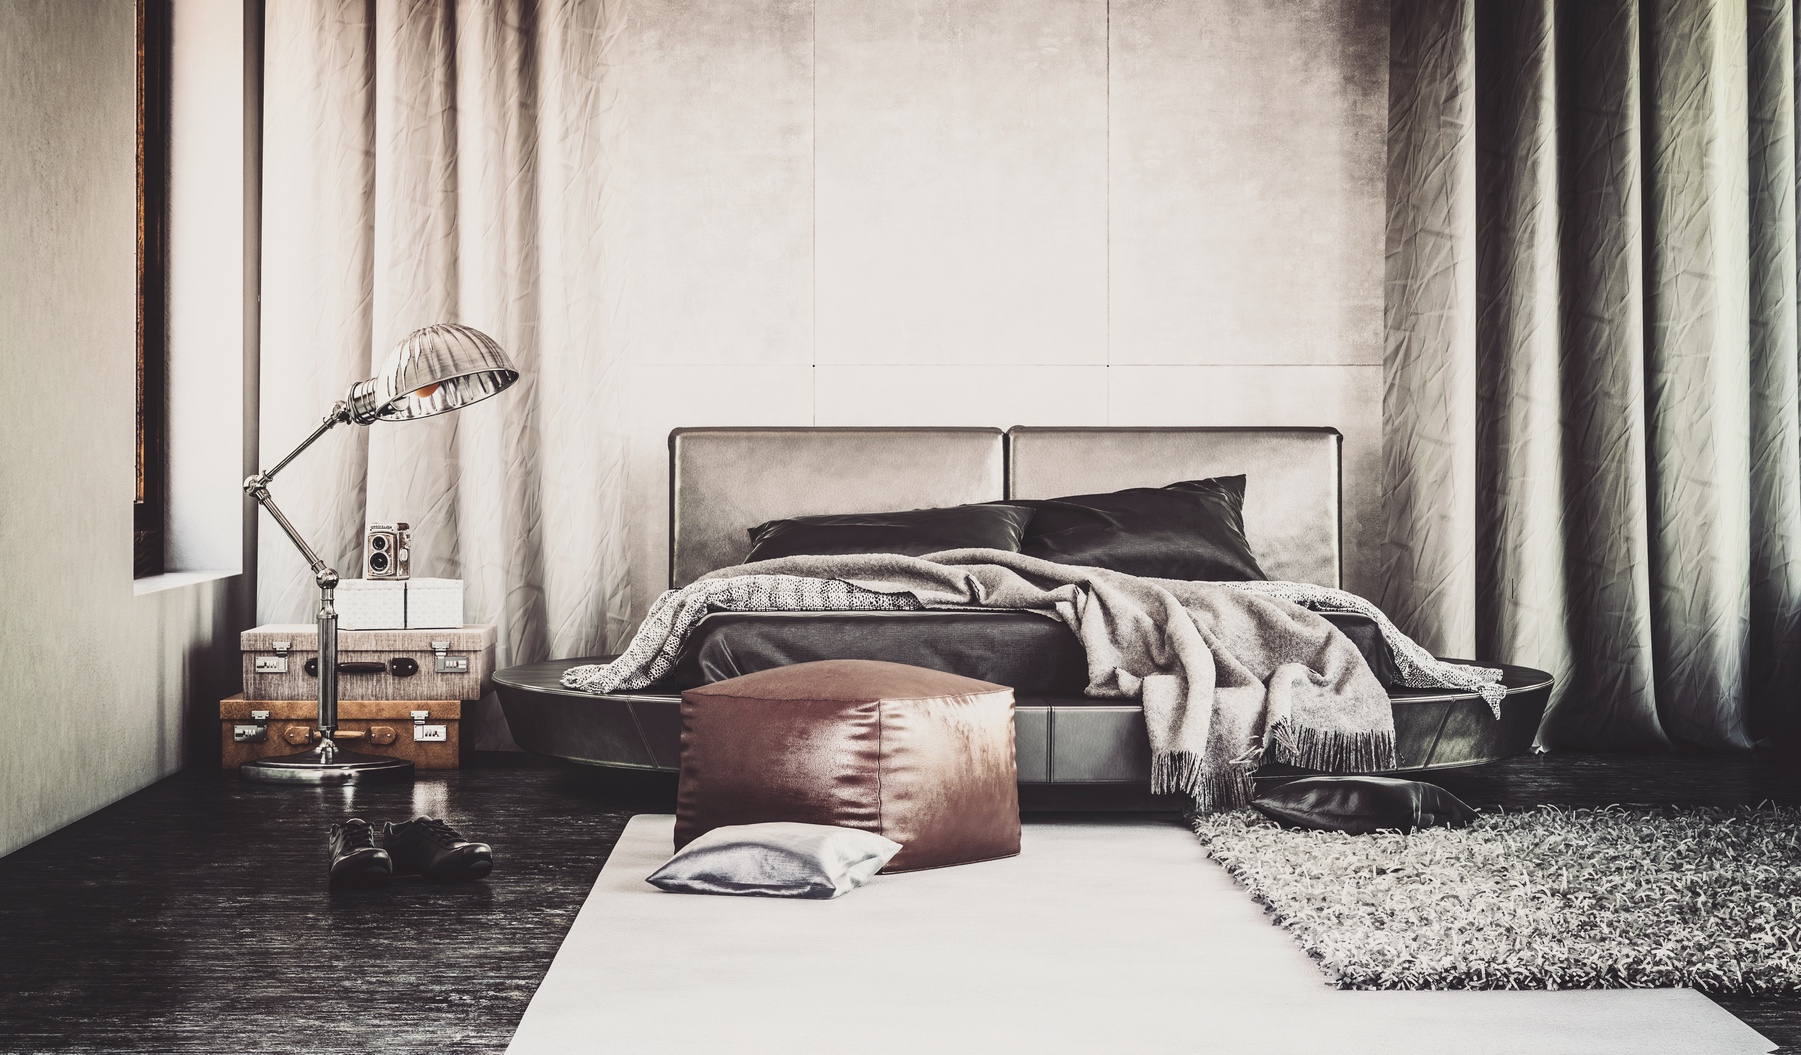 Stylish hotel room